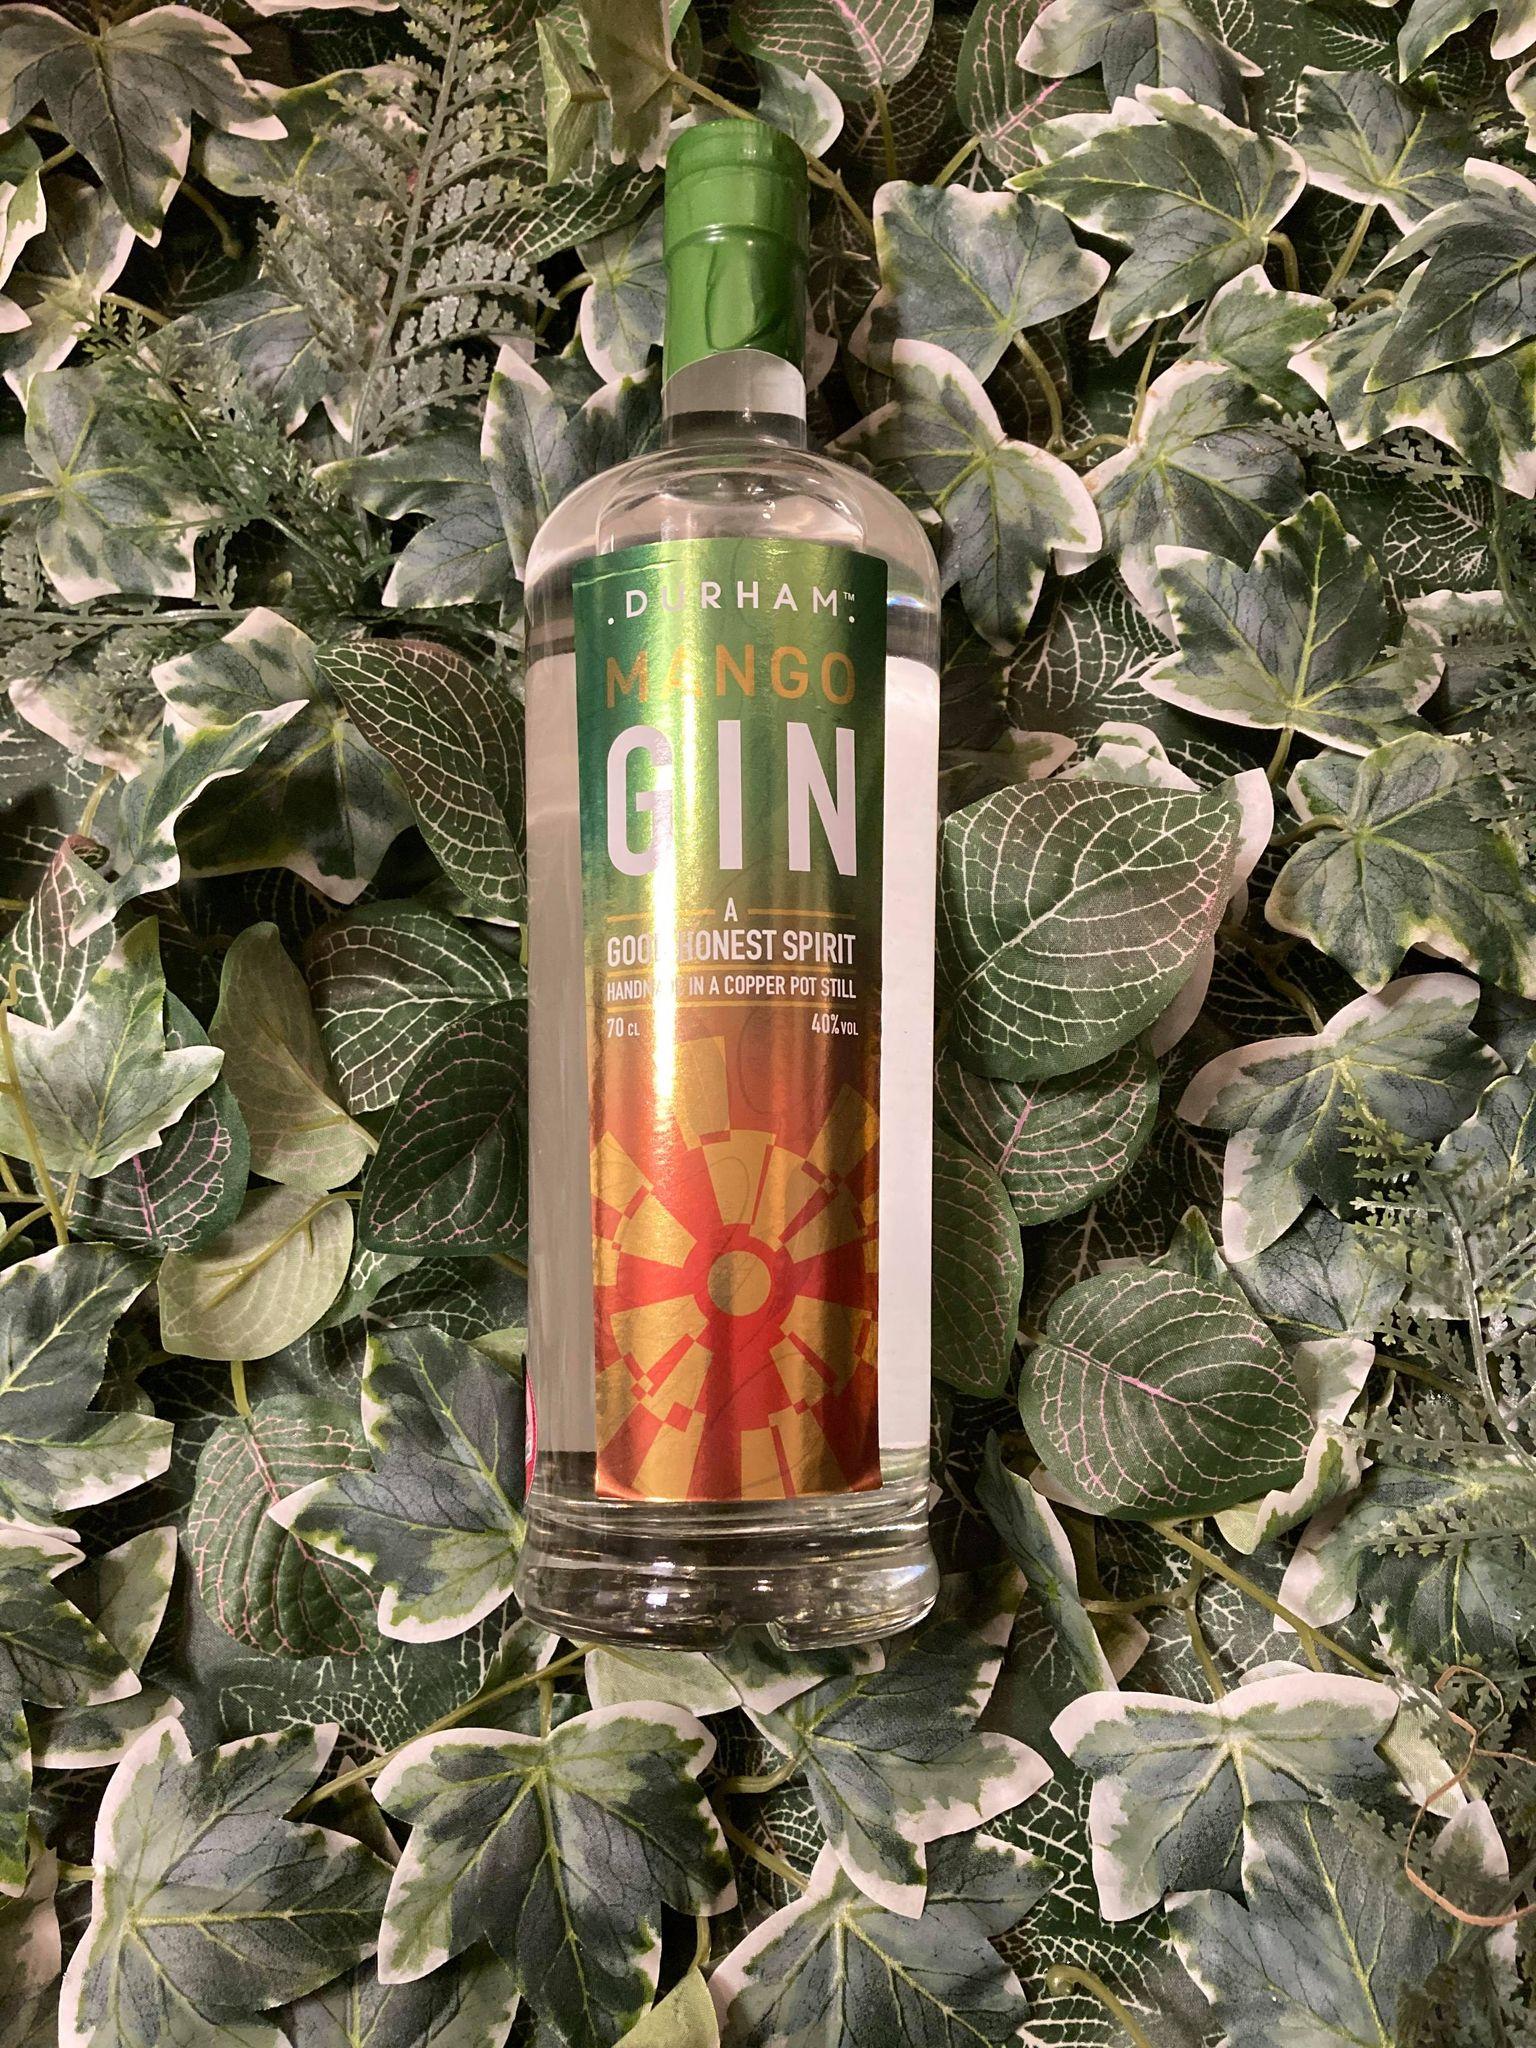 Durham Mango Gin